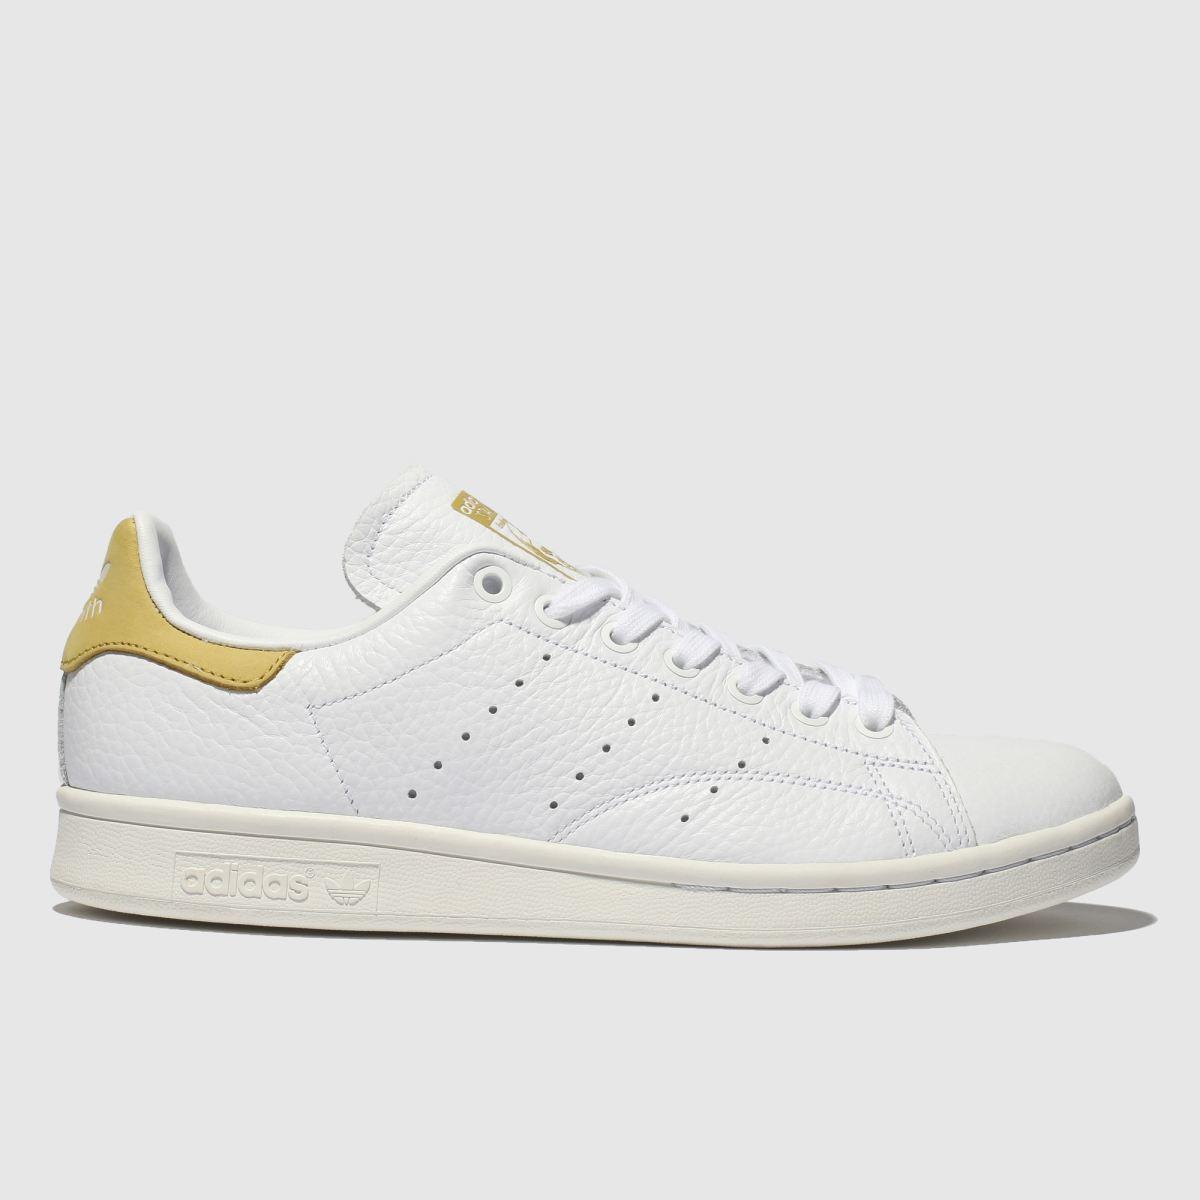 Adidas White & Yellow Stan Smith Trainers